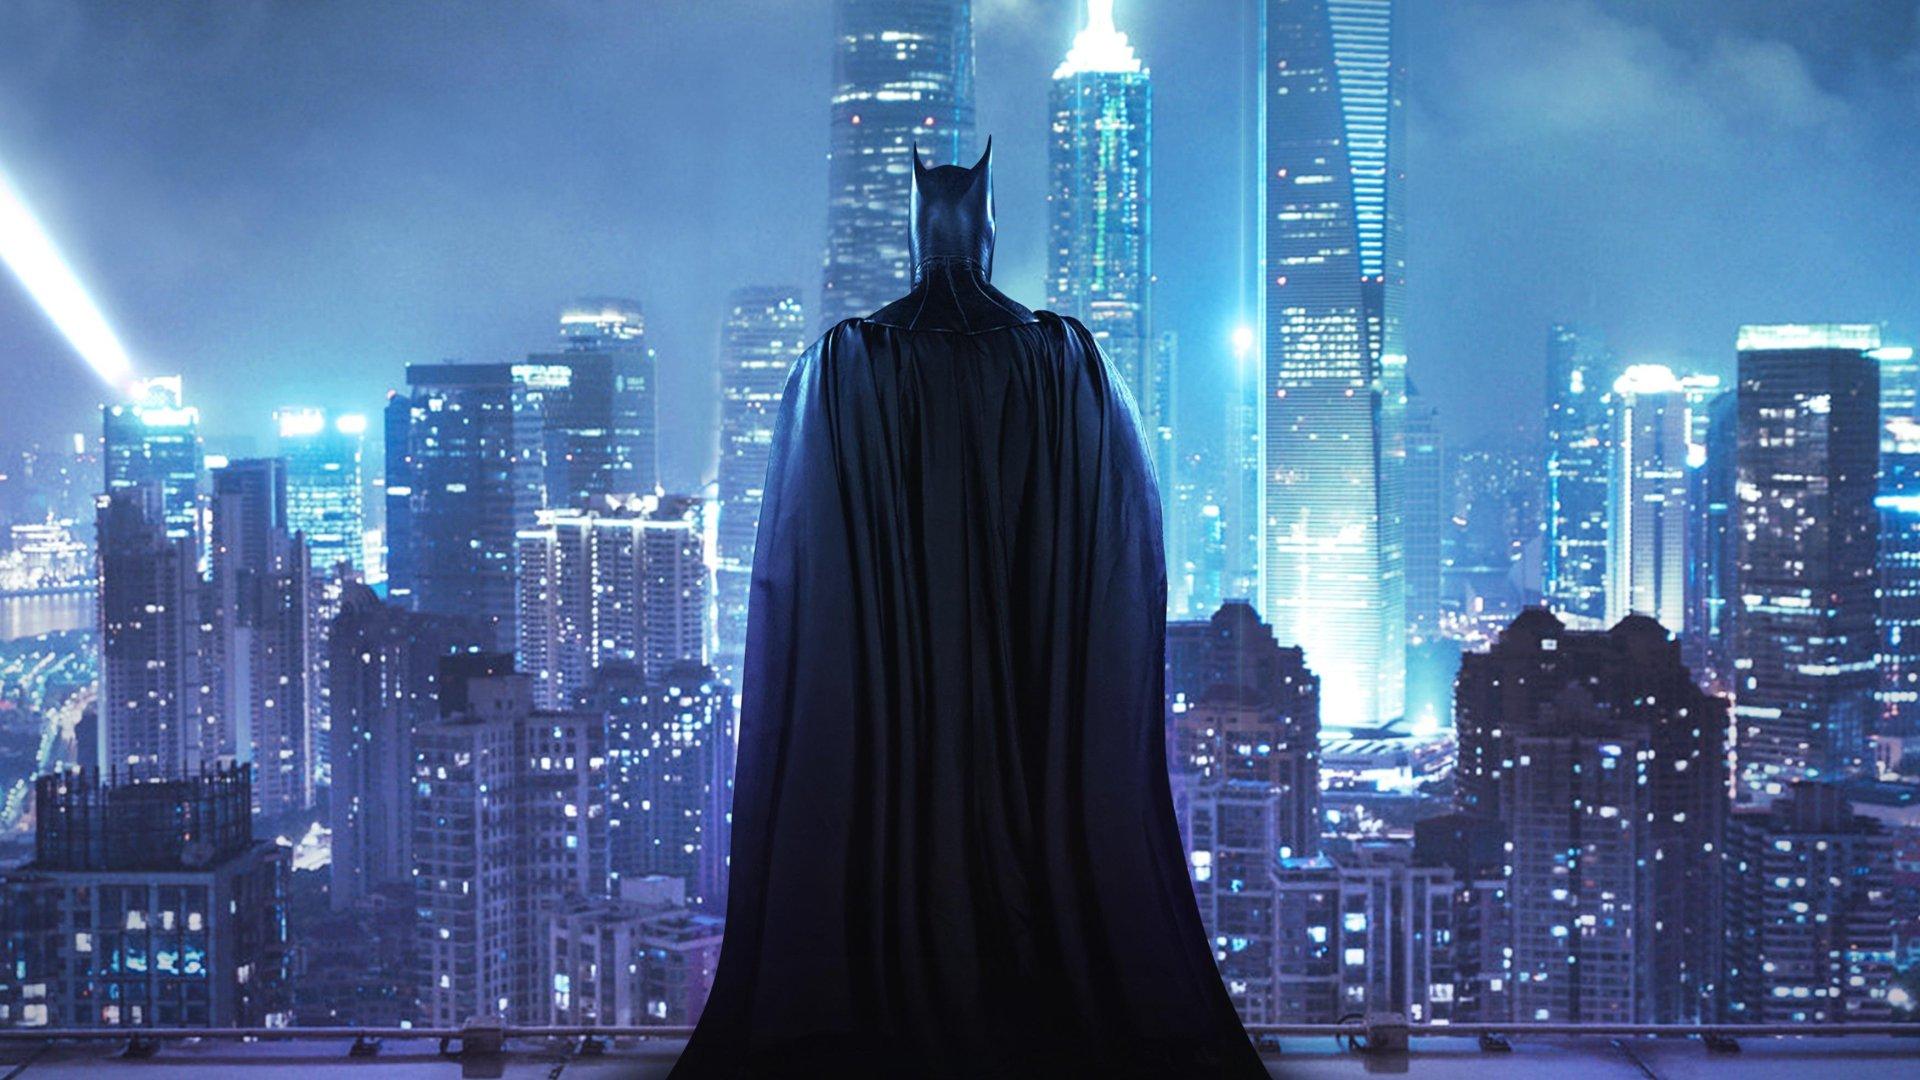 best batman wallpaper, batman theme wallpaper